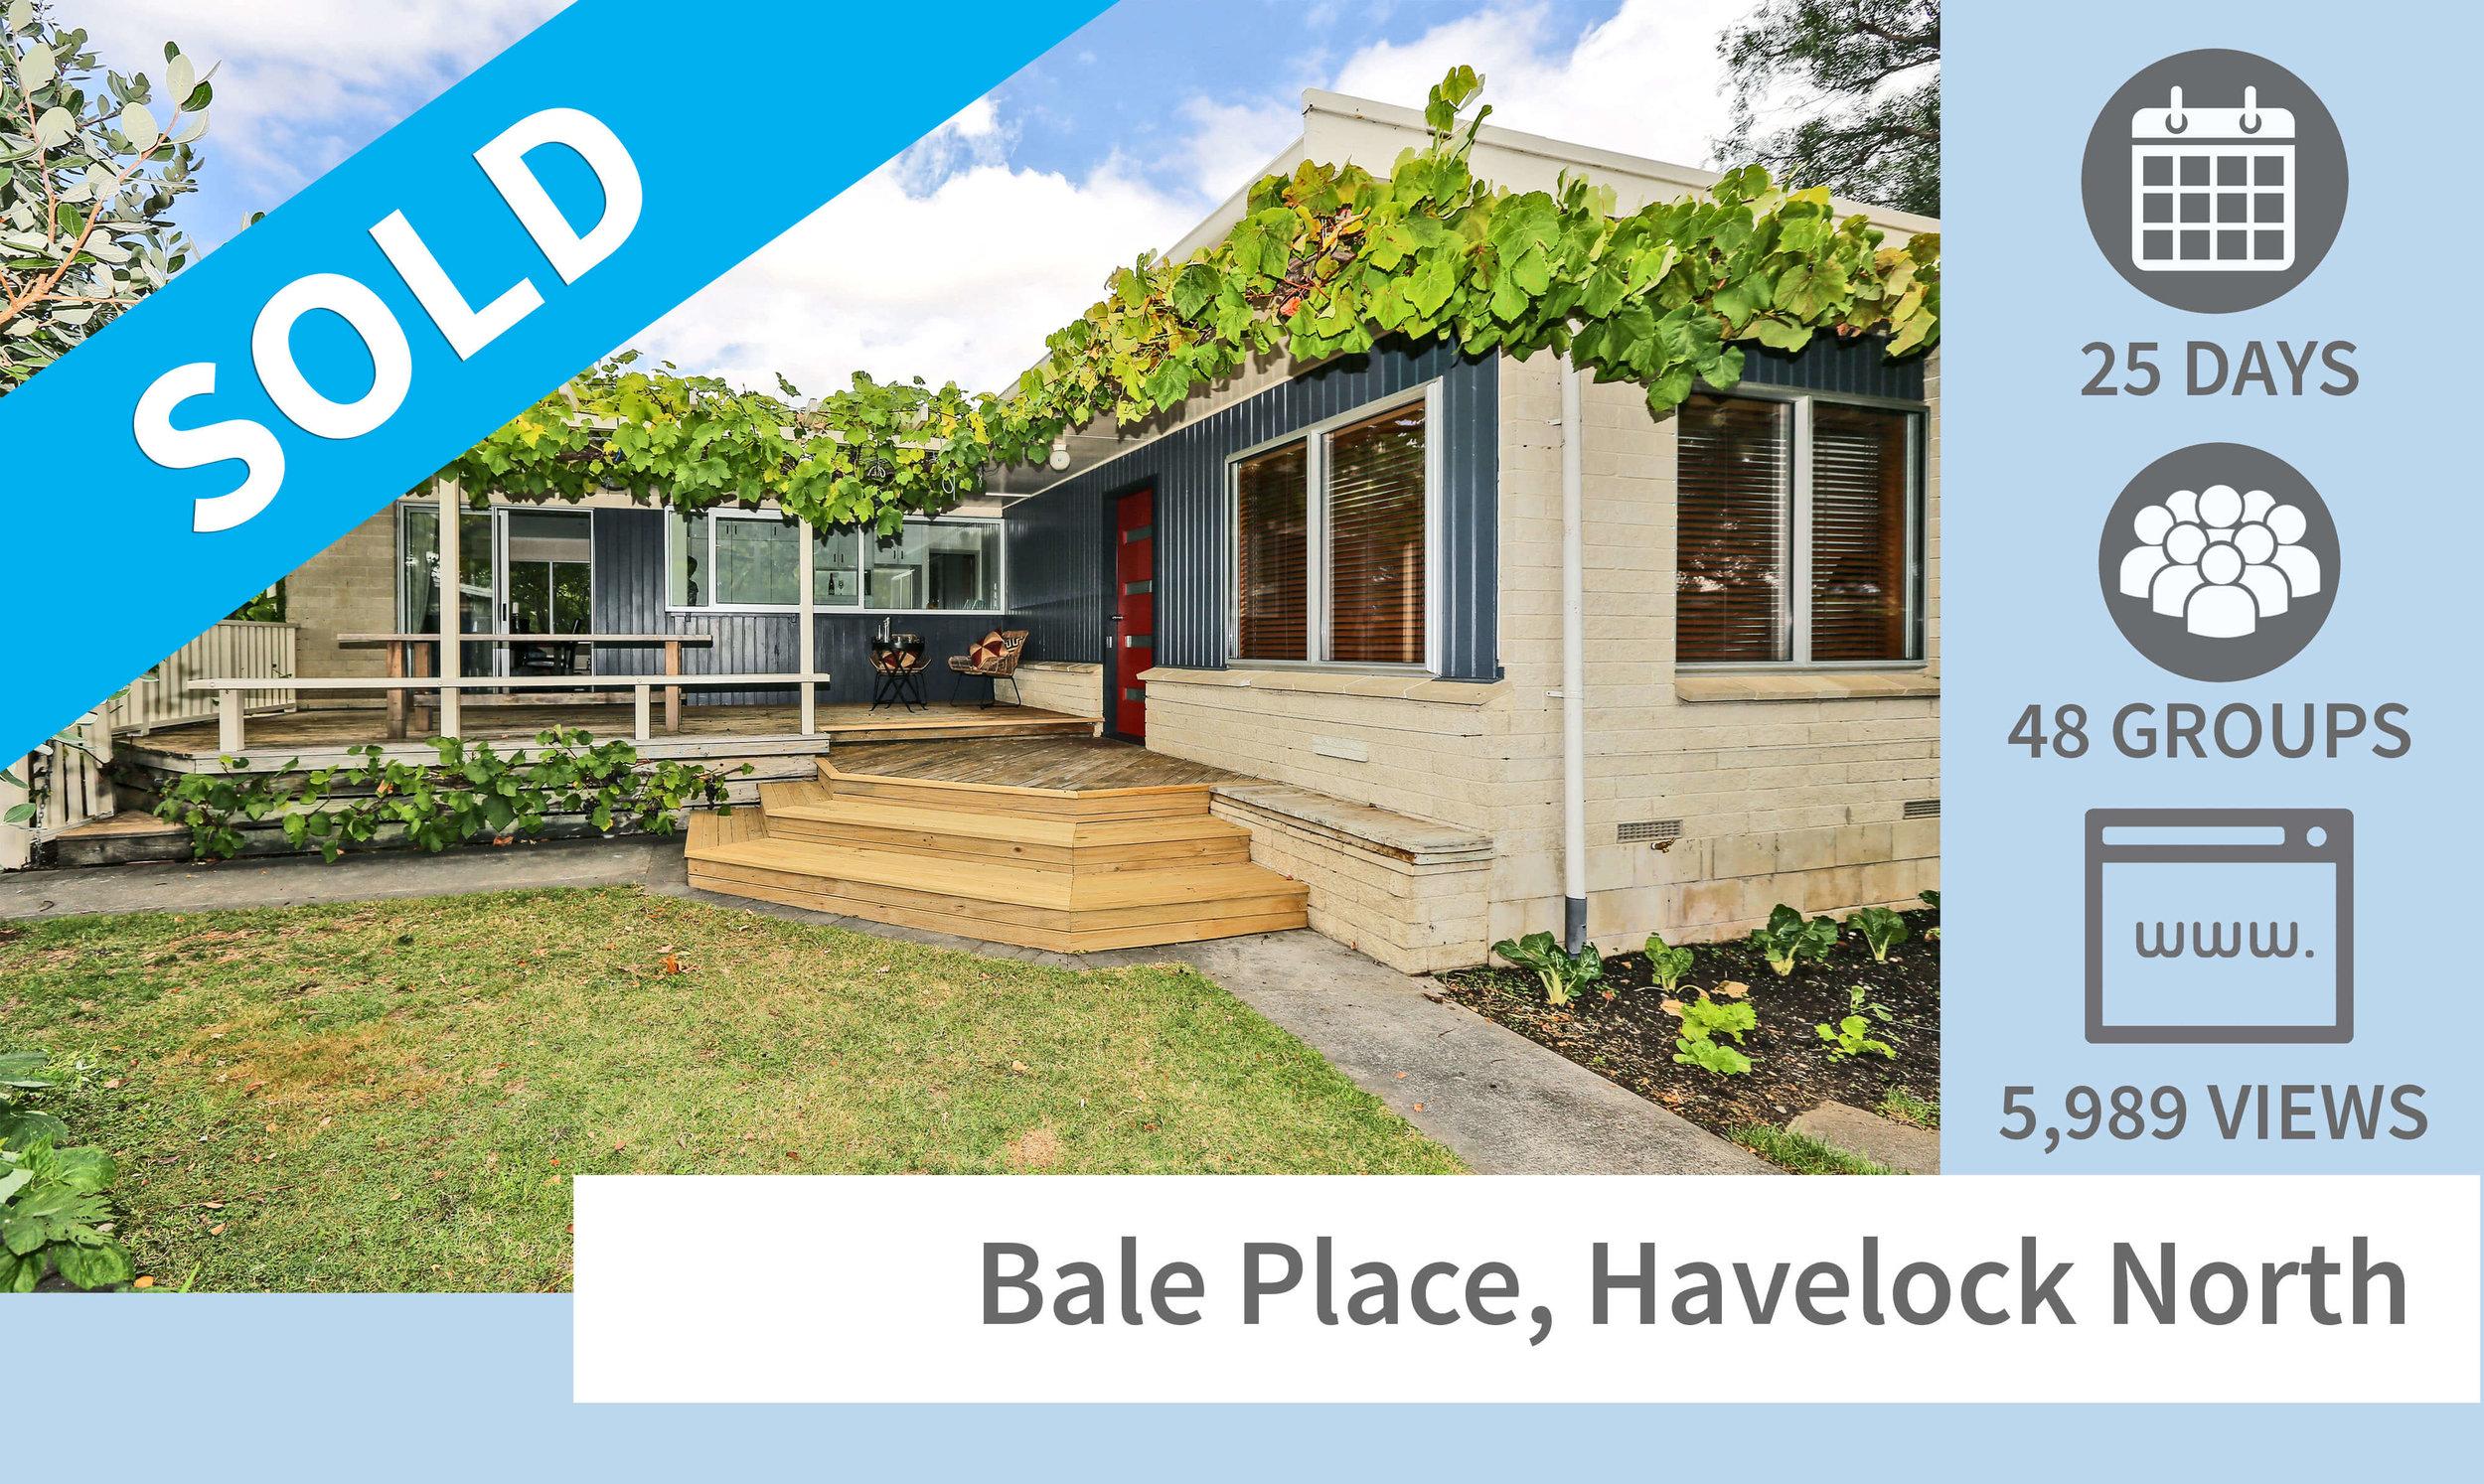 The Mackies Bale Place Havelock North Hawke's Bay